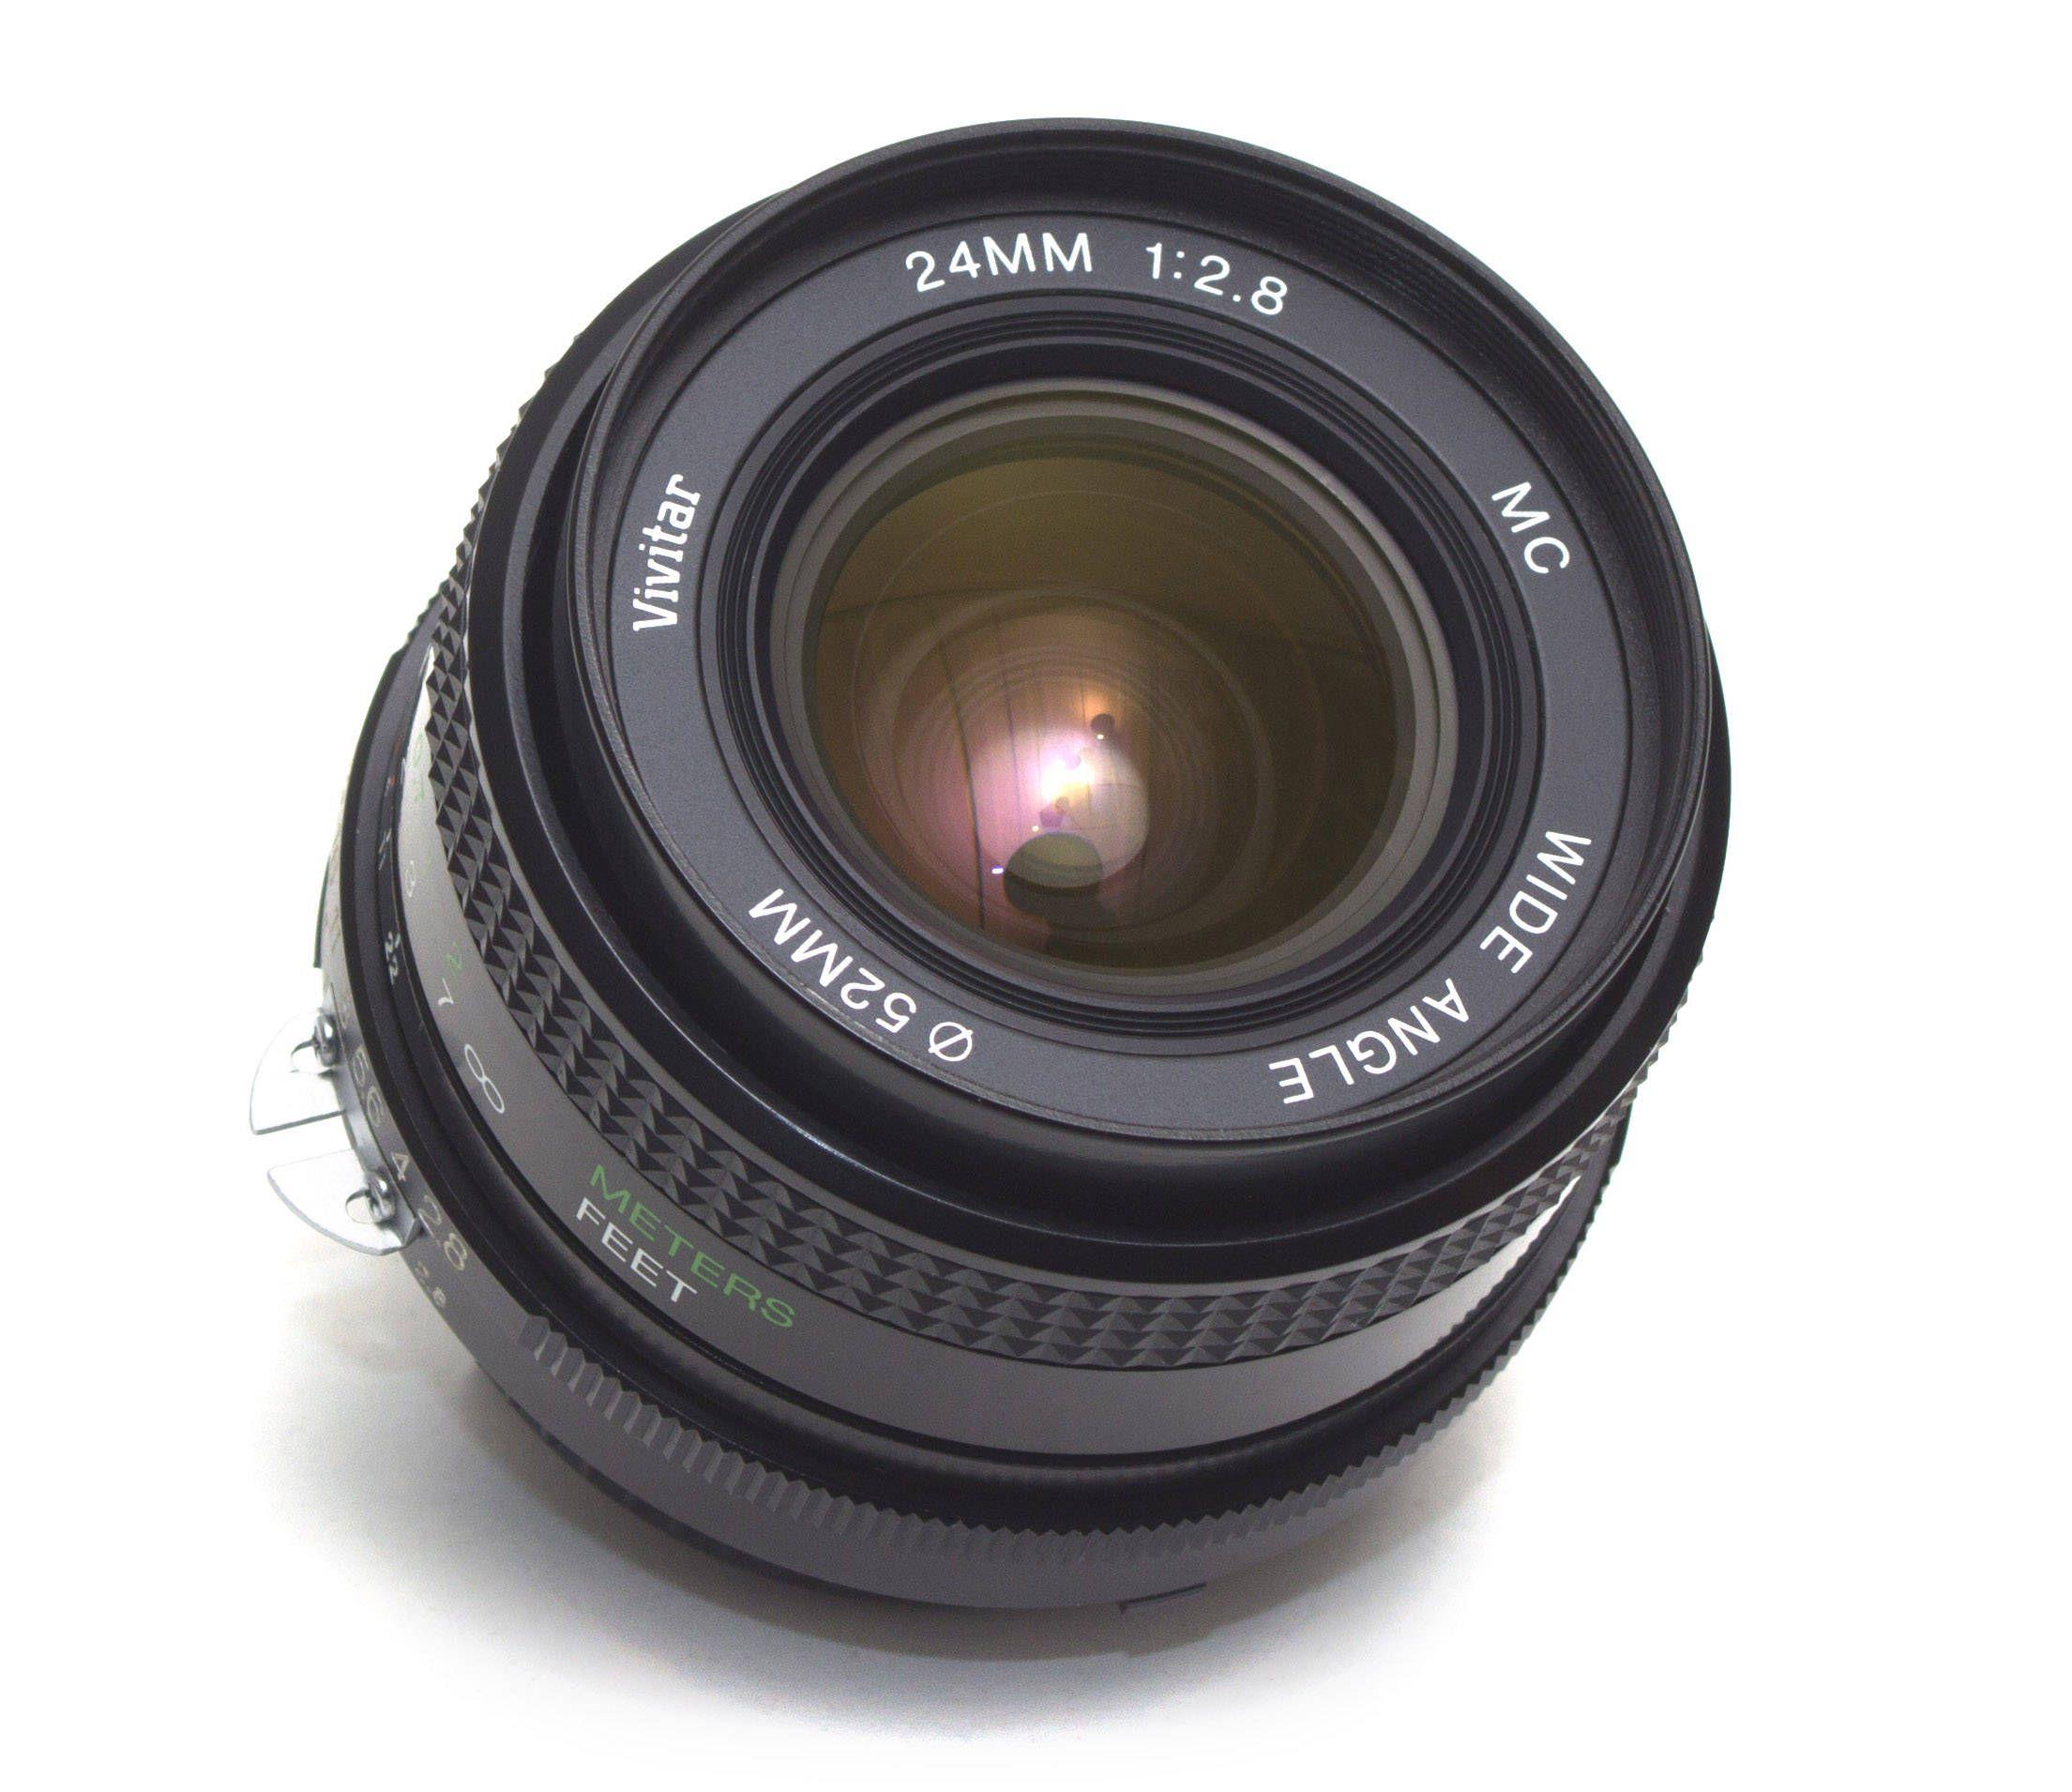 Vivitar 24mm F2 8 Wide Angle Prime Lens Nikon F Ai S Fit Manual Focus Fx Japan By 7cameras On Etsy Best Camera Cameras For Sale Vintage Lenses